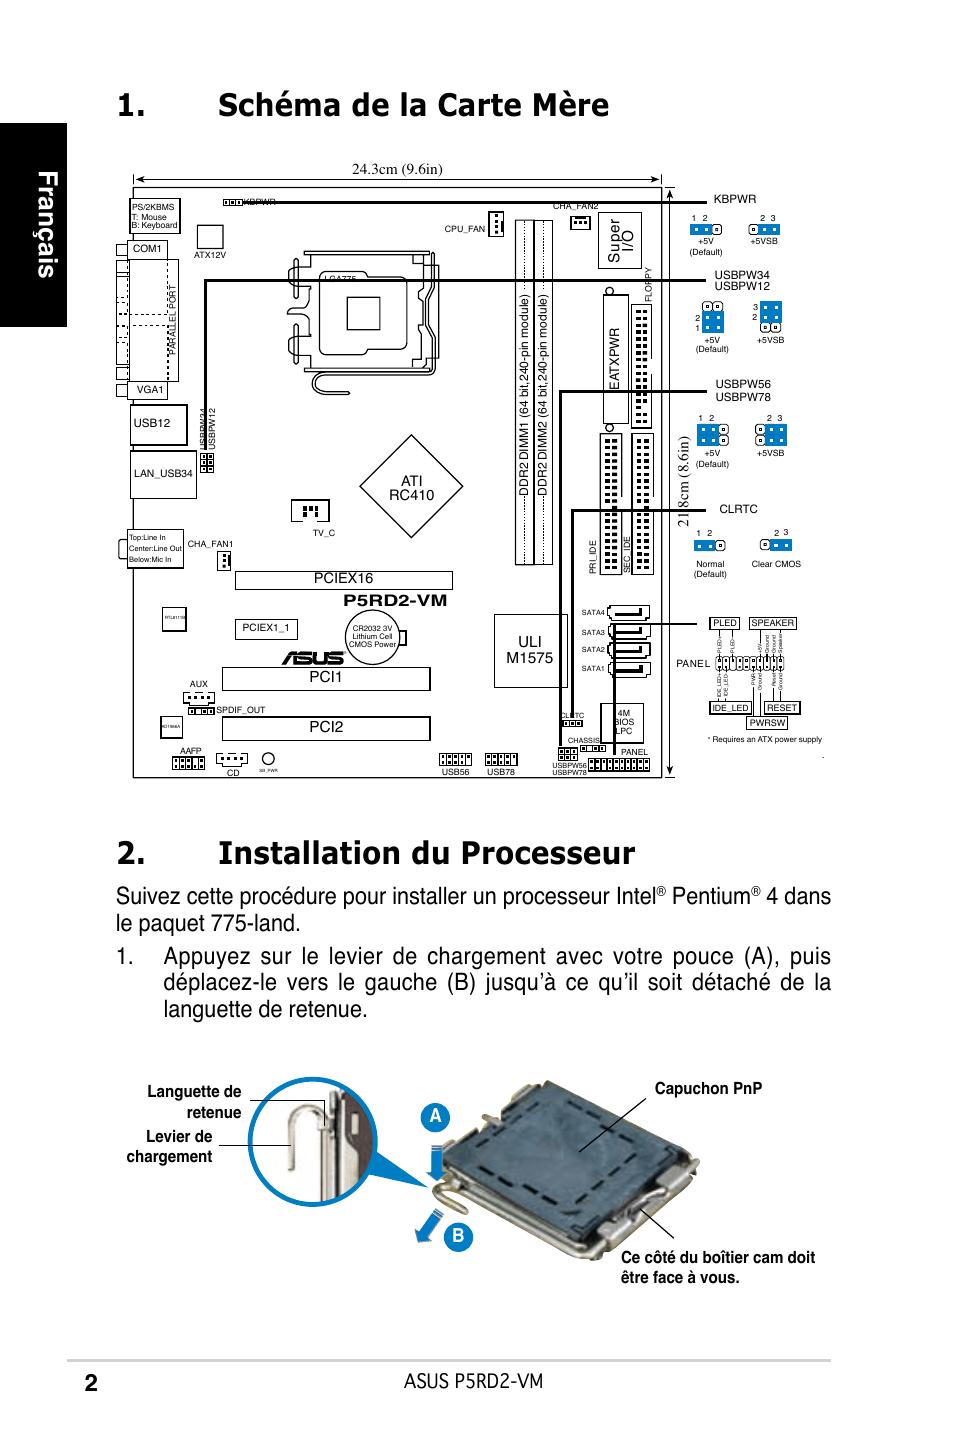 Installation du processeur, Schéma de la carte mère